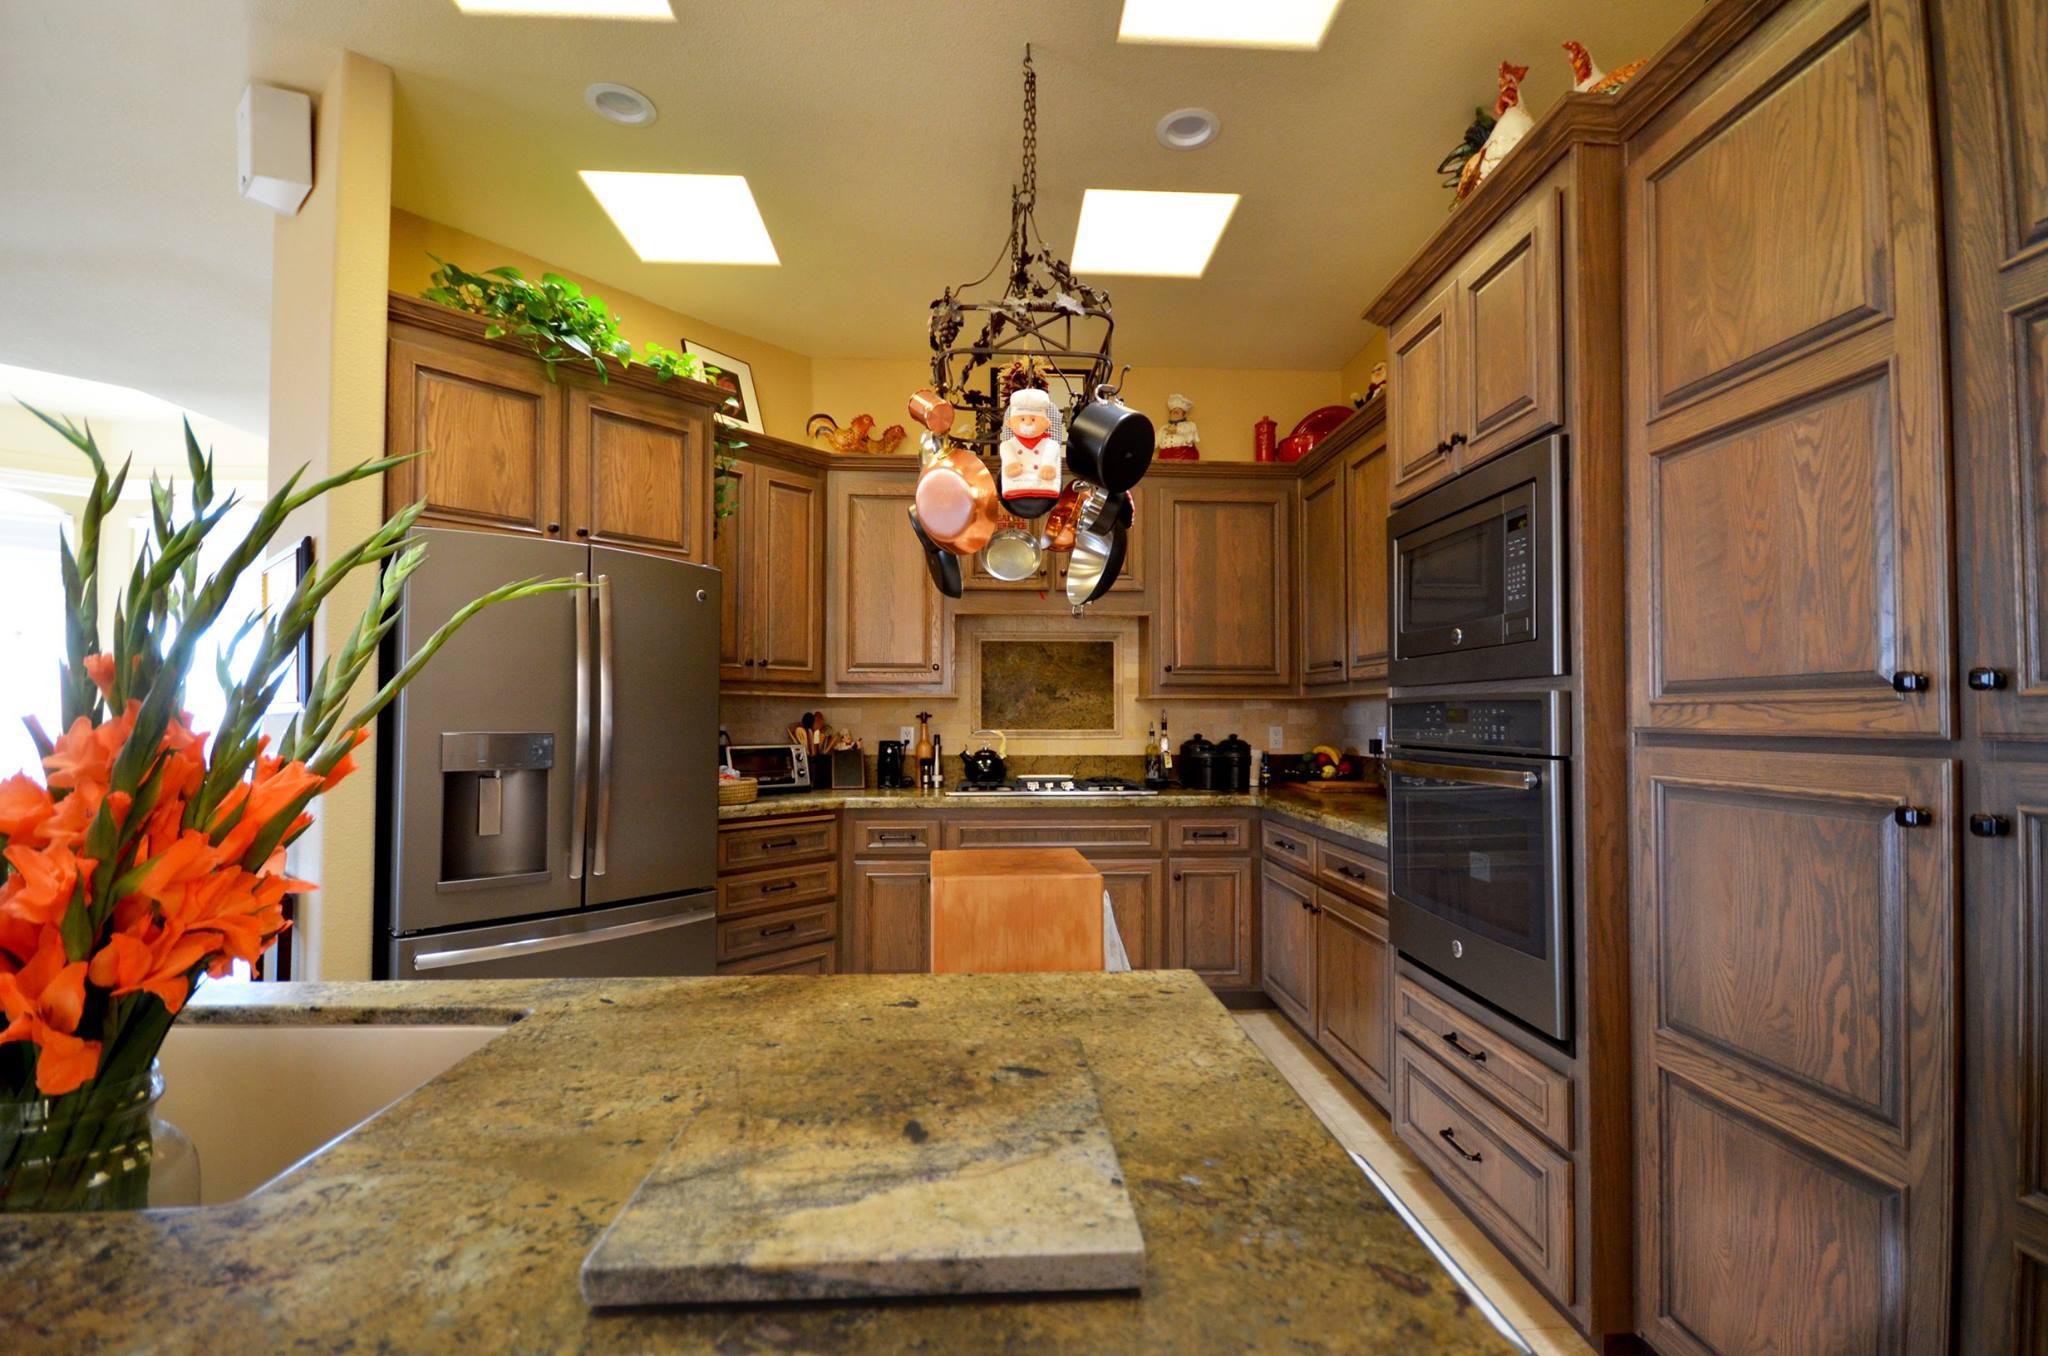 Kitchen Remodel in Pismo Beach, CA